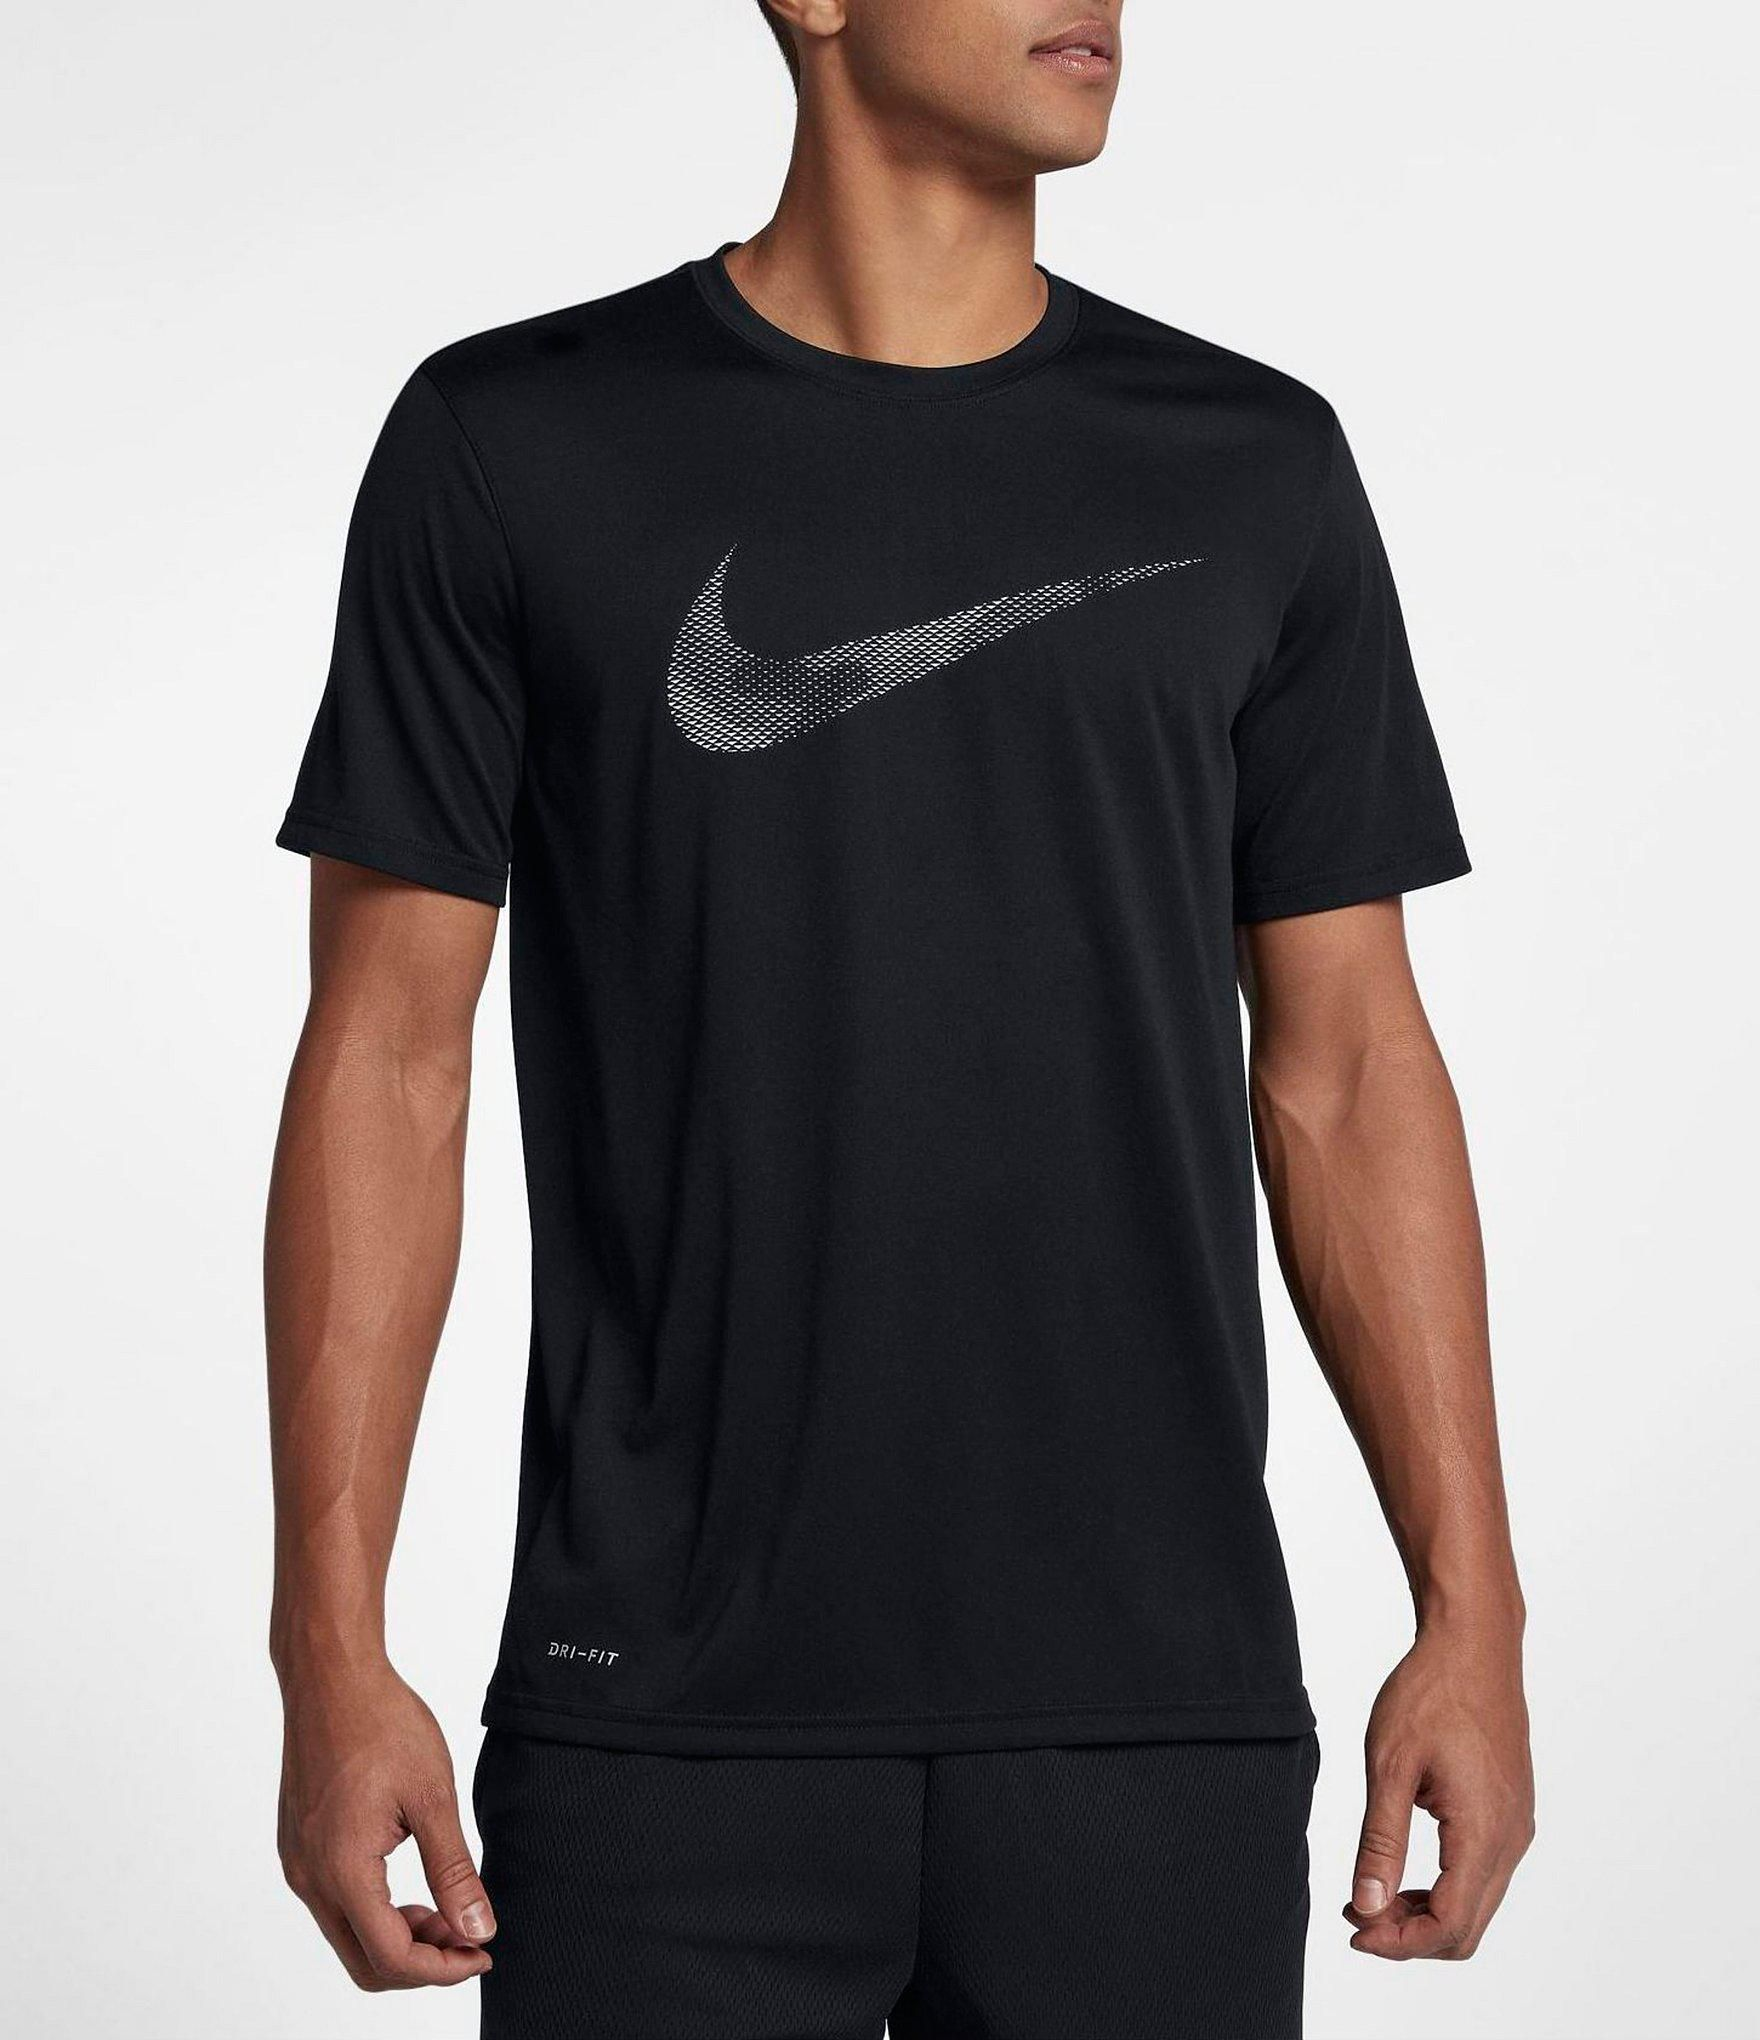 5ac52f8a4 Camo Nike Swoosh Logo - Nike Dry Legend Camo Swoosh Short-sleeve Logo T-